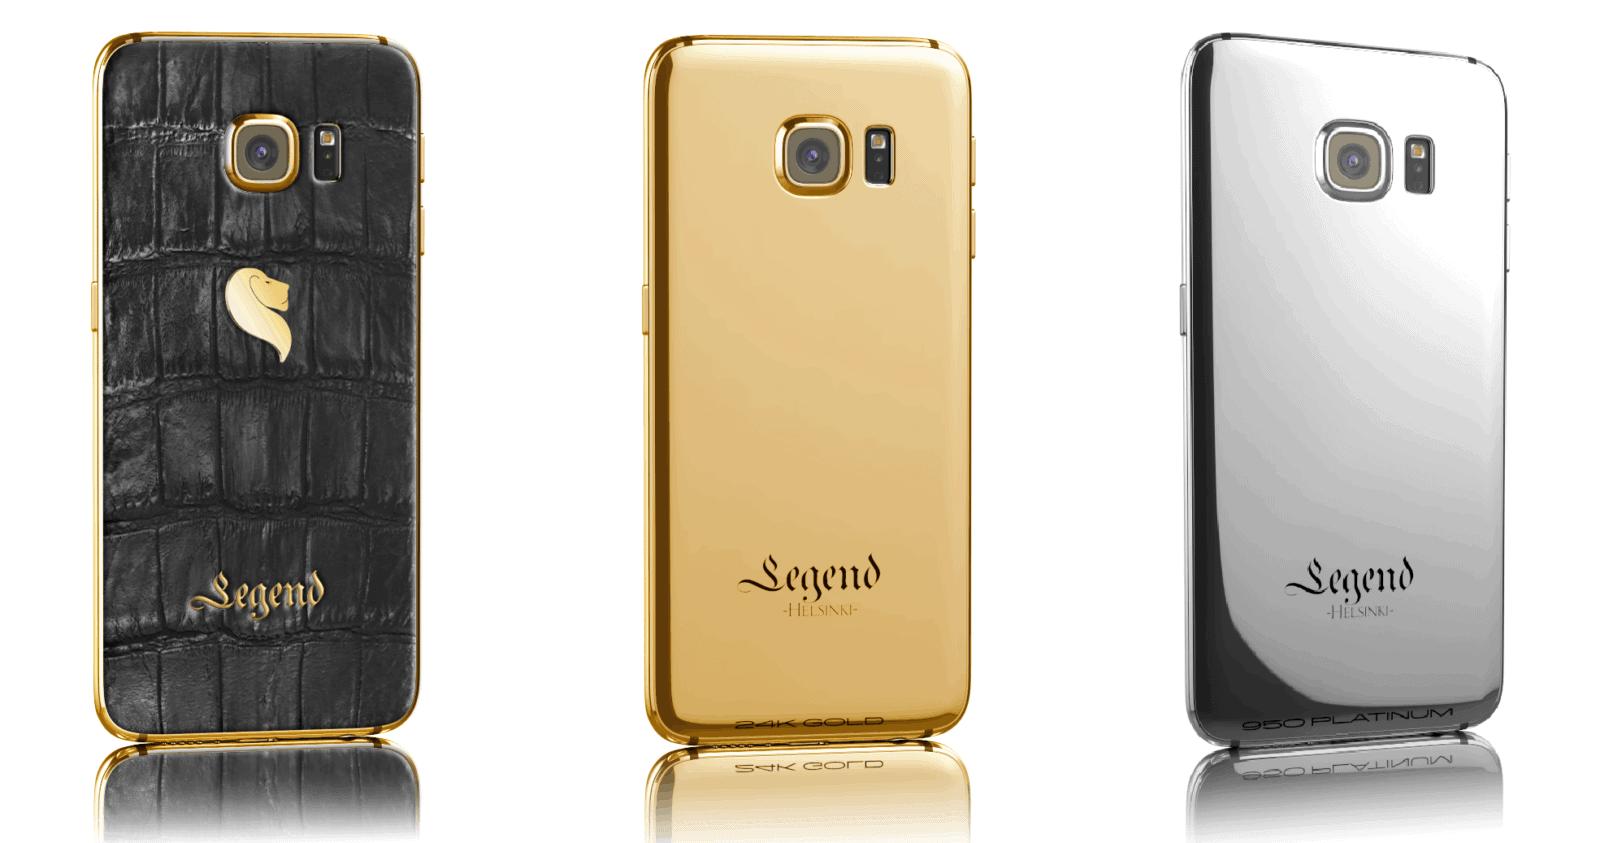 Galaxy-s6-edge-24k-gold-plated-by-legend-helsinki (1)